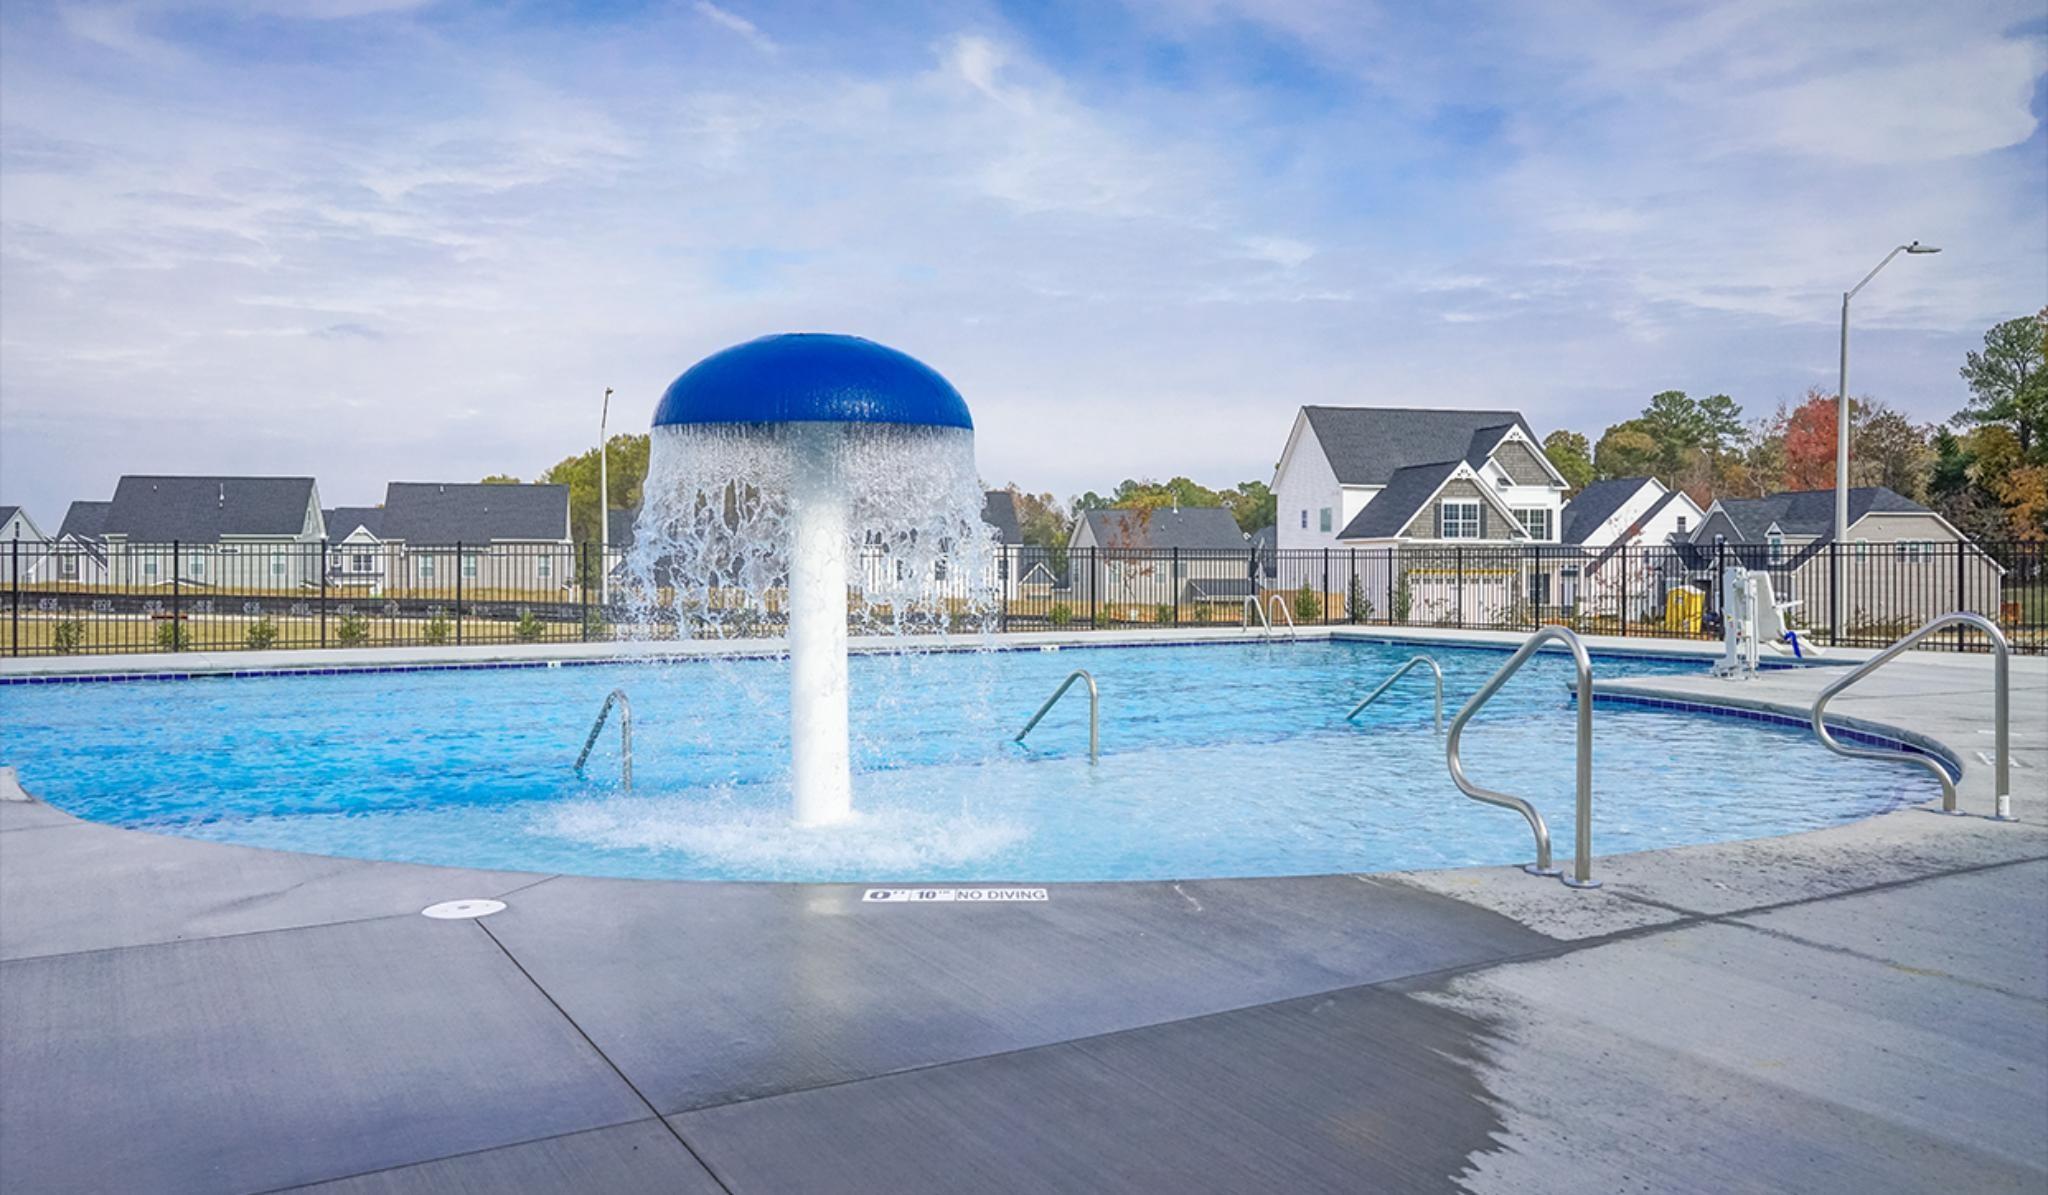 Sonoma Springs Fuquay-Varina community pool